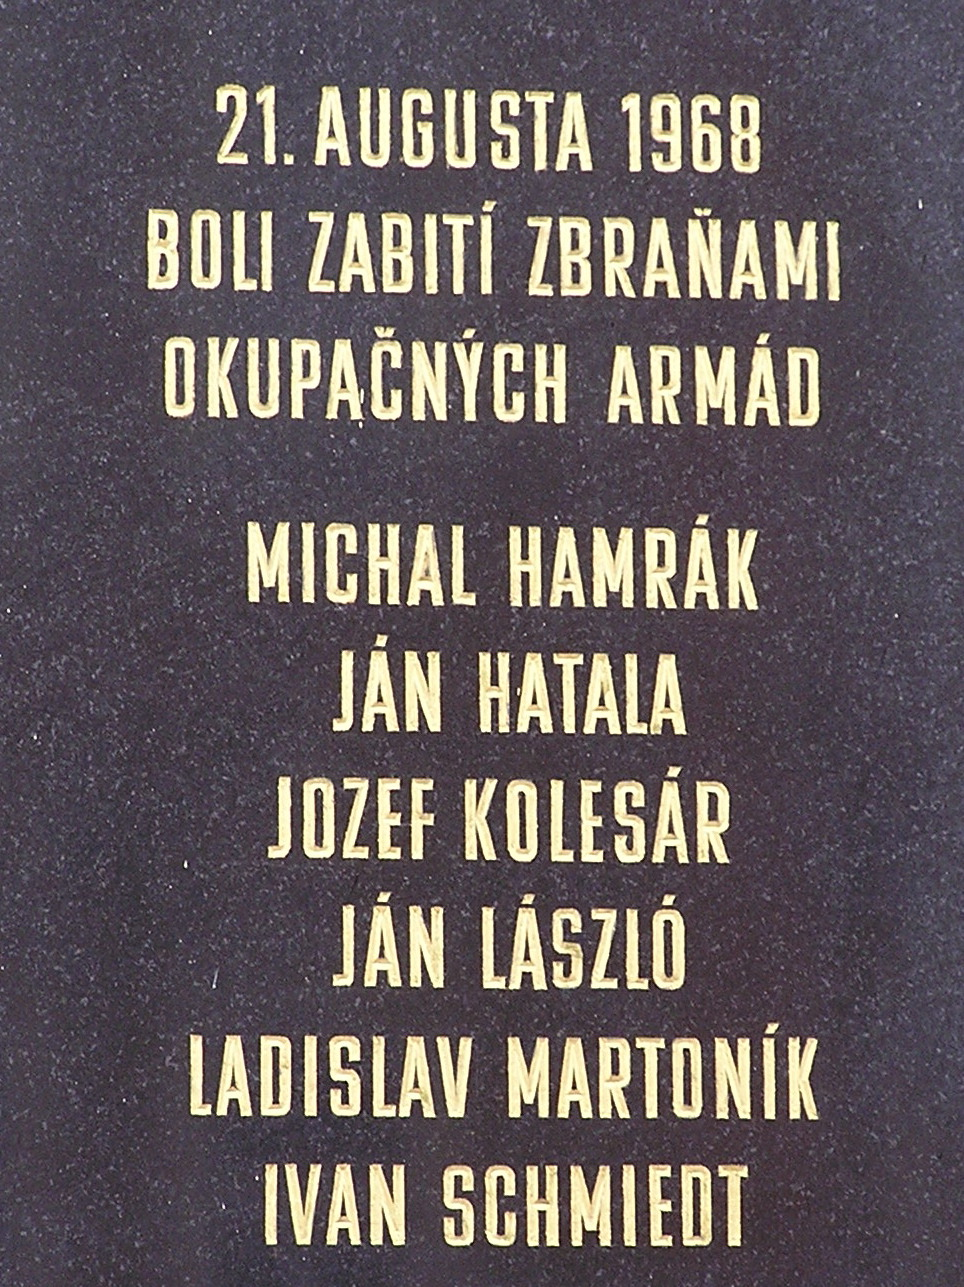 Prague Spring memorial plate in Ko ice, Slovakia